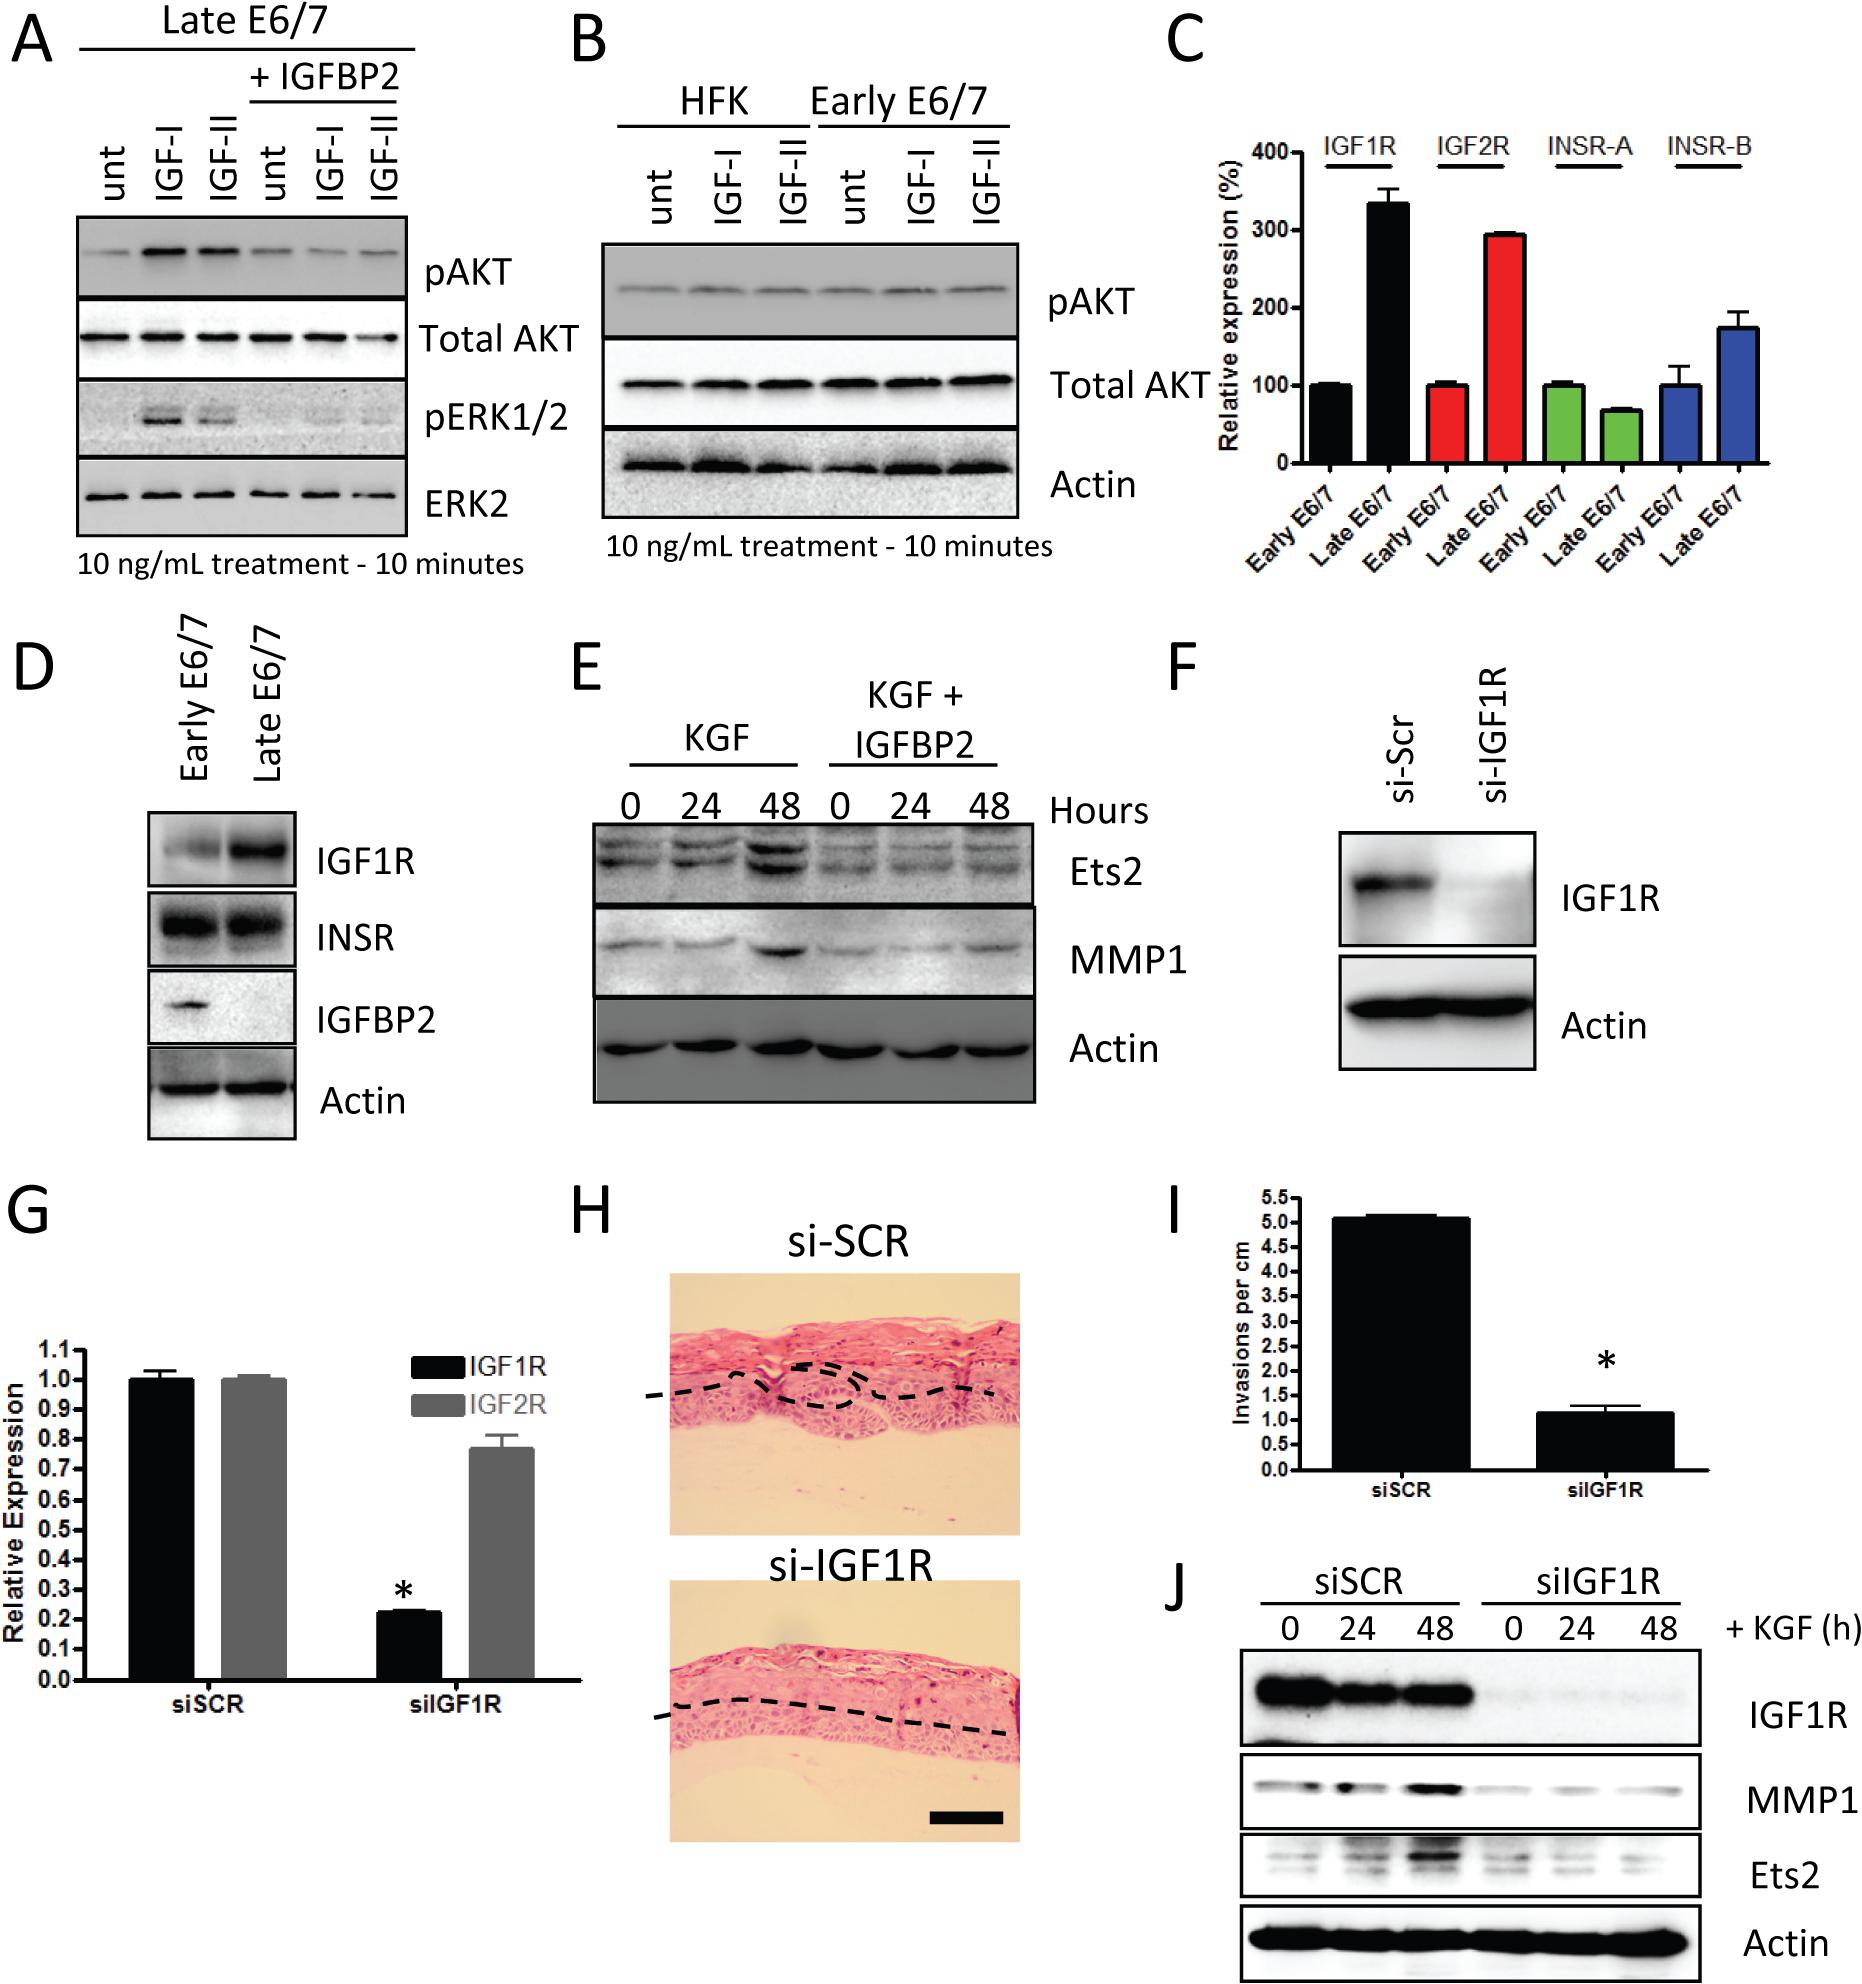 IGFBP2 blocks pro-invasive IGF1R signalling.